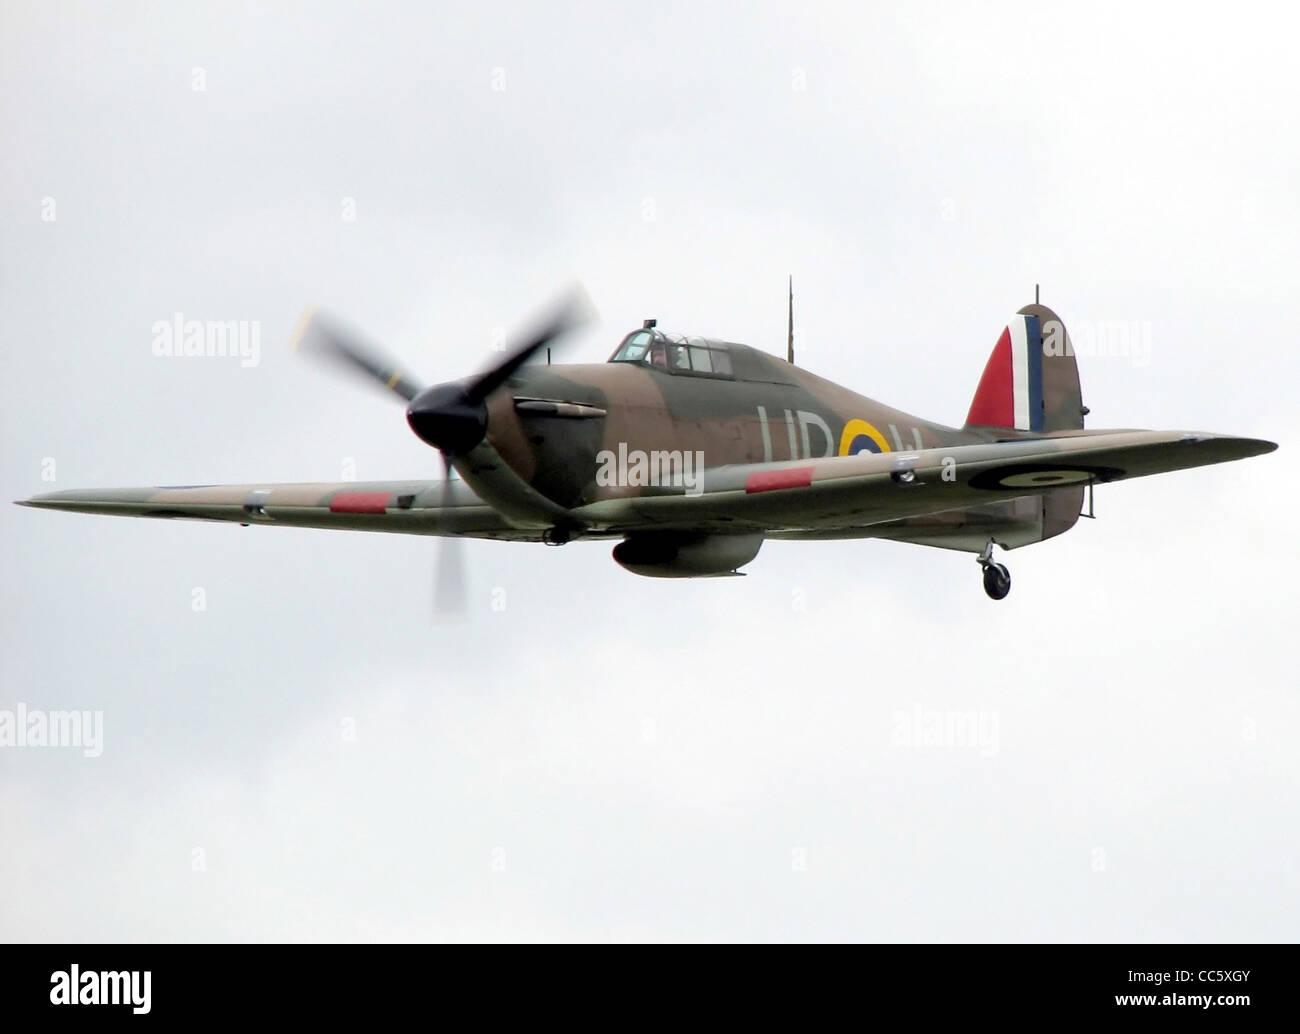 Hurricane Mk1, RAF serial R4118 - Stock Image